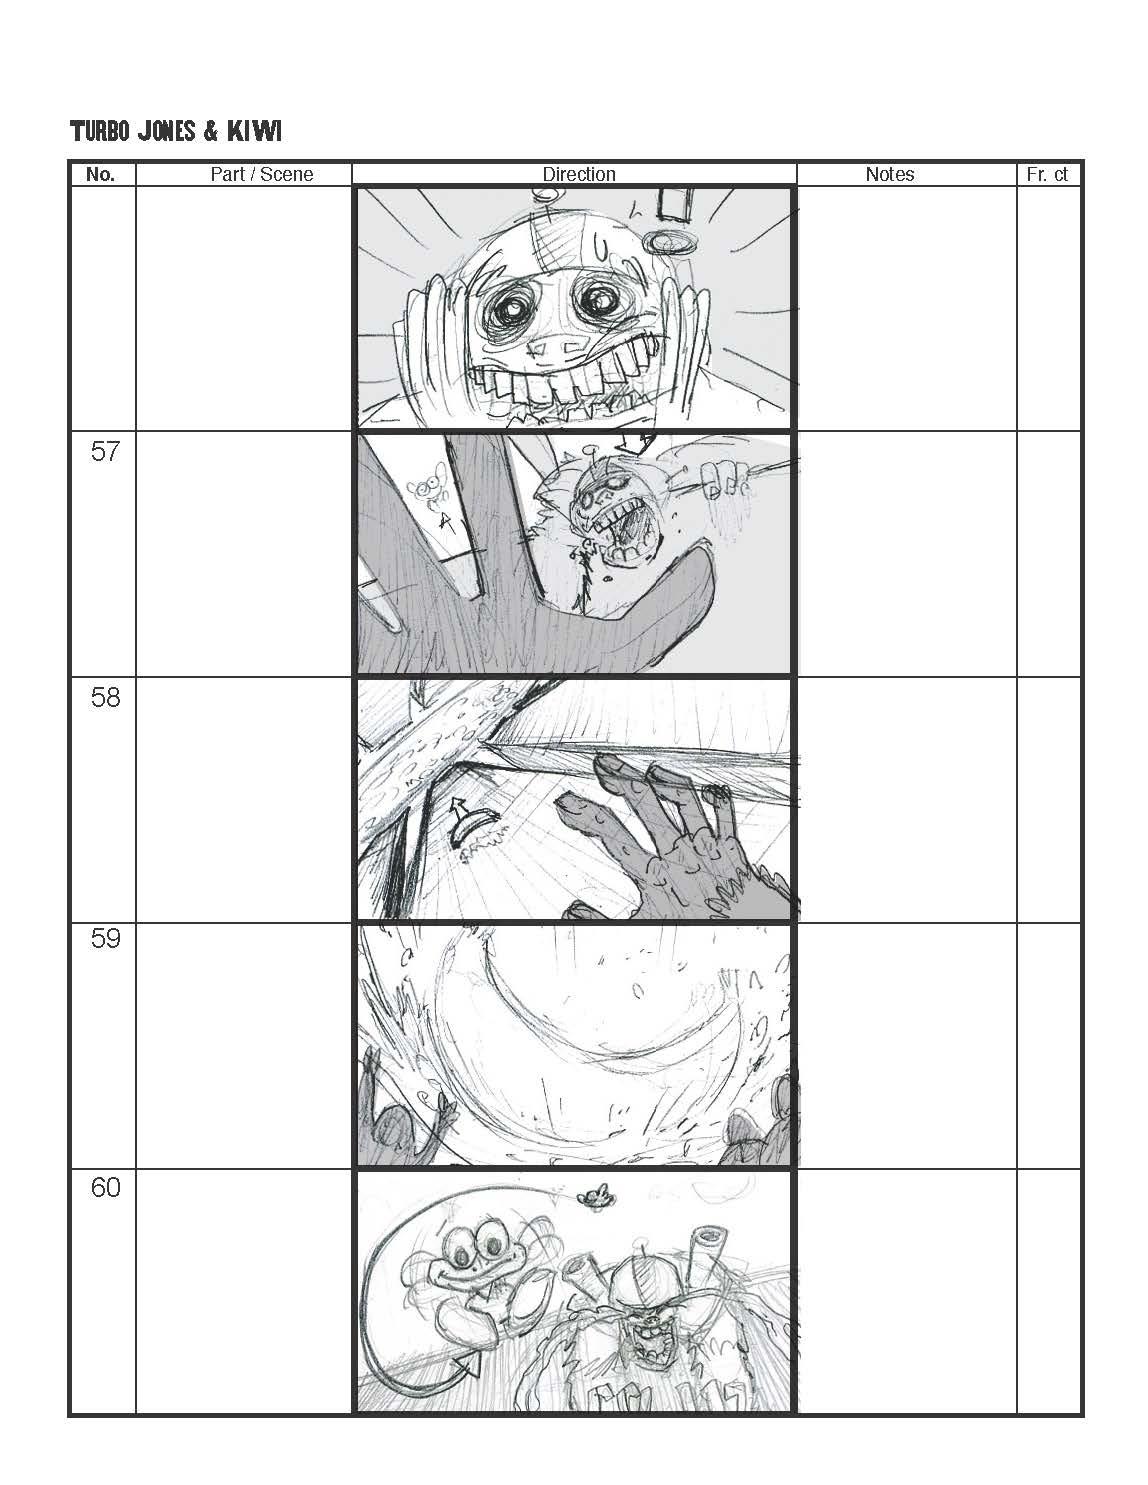 TJK_Storyboards_v01_HIGH_Page_30.jpg